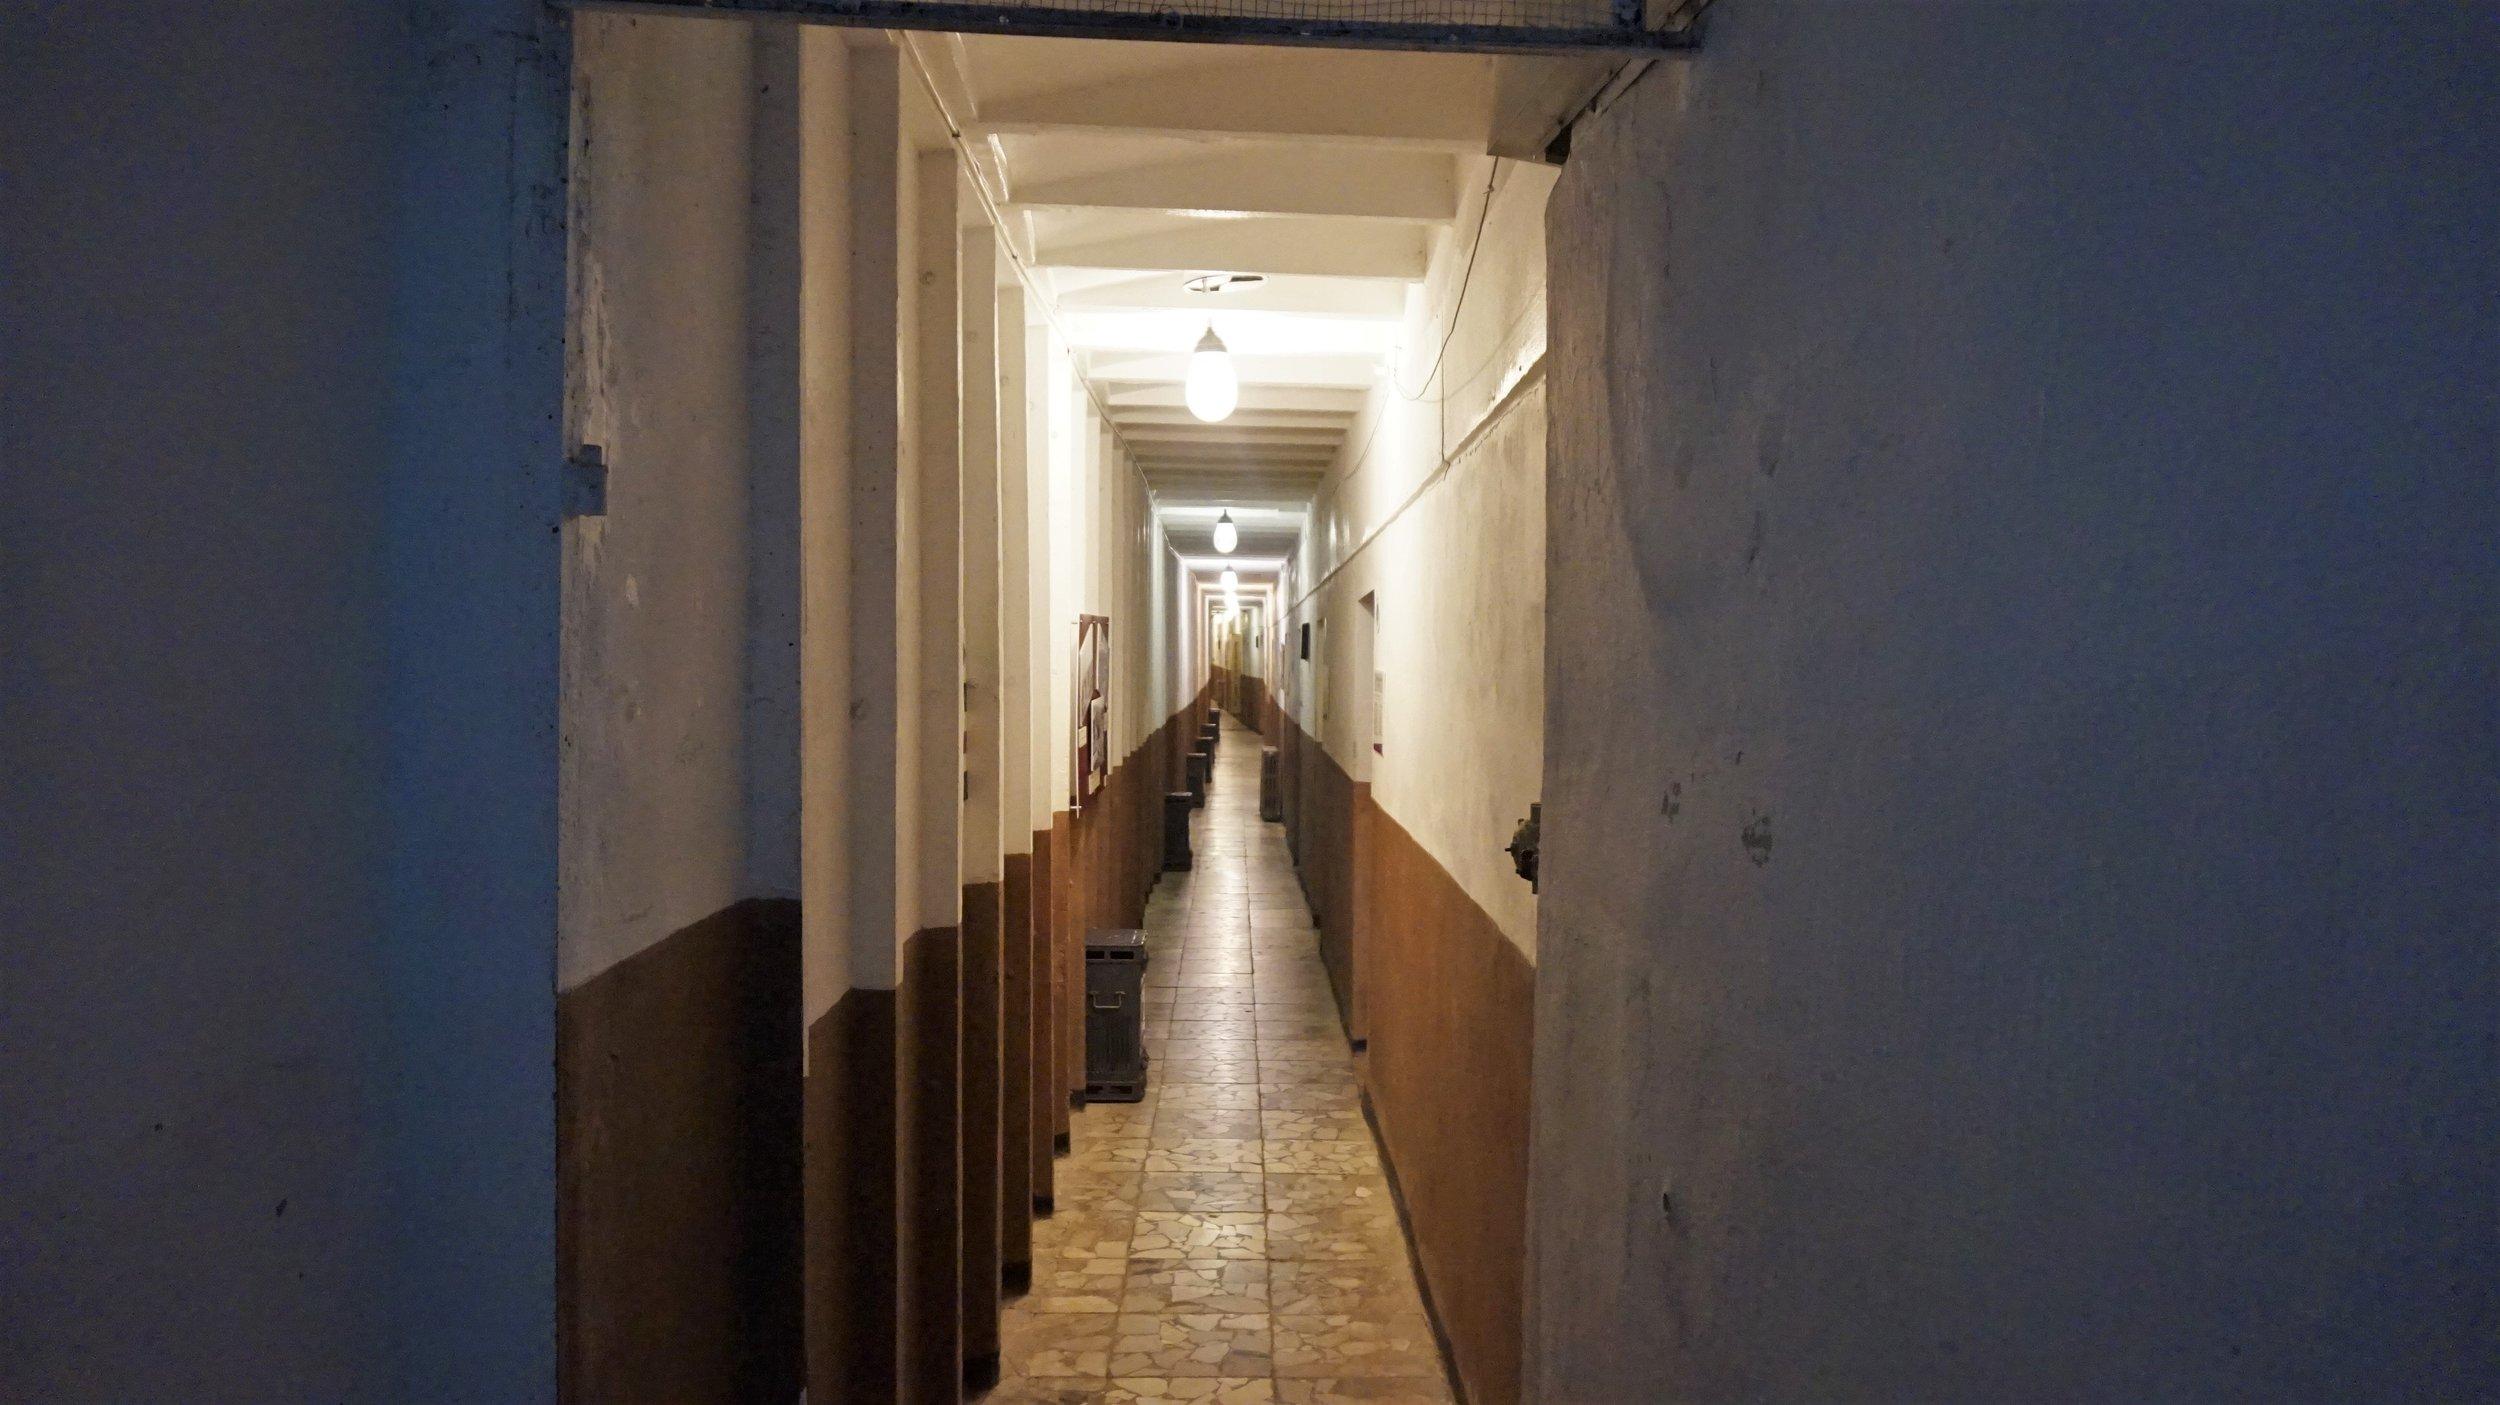 bunkart museum tirana top things to do in albania